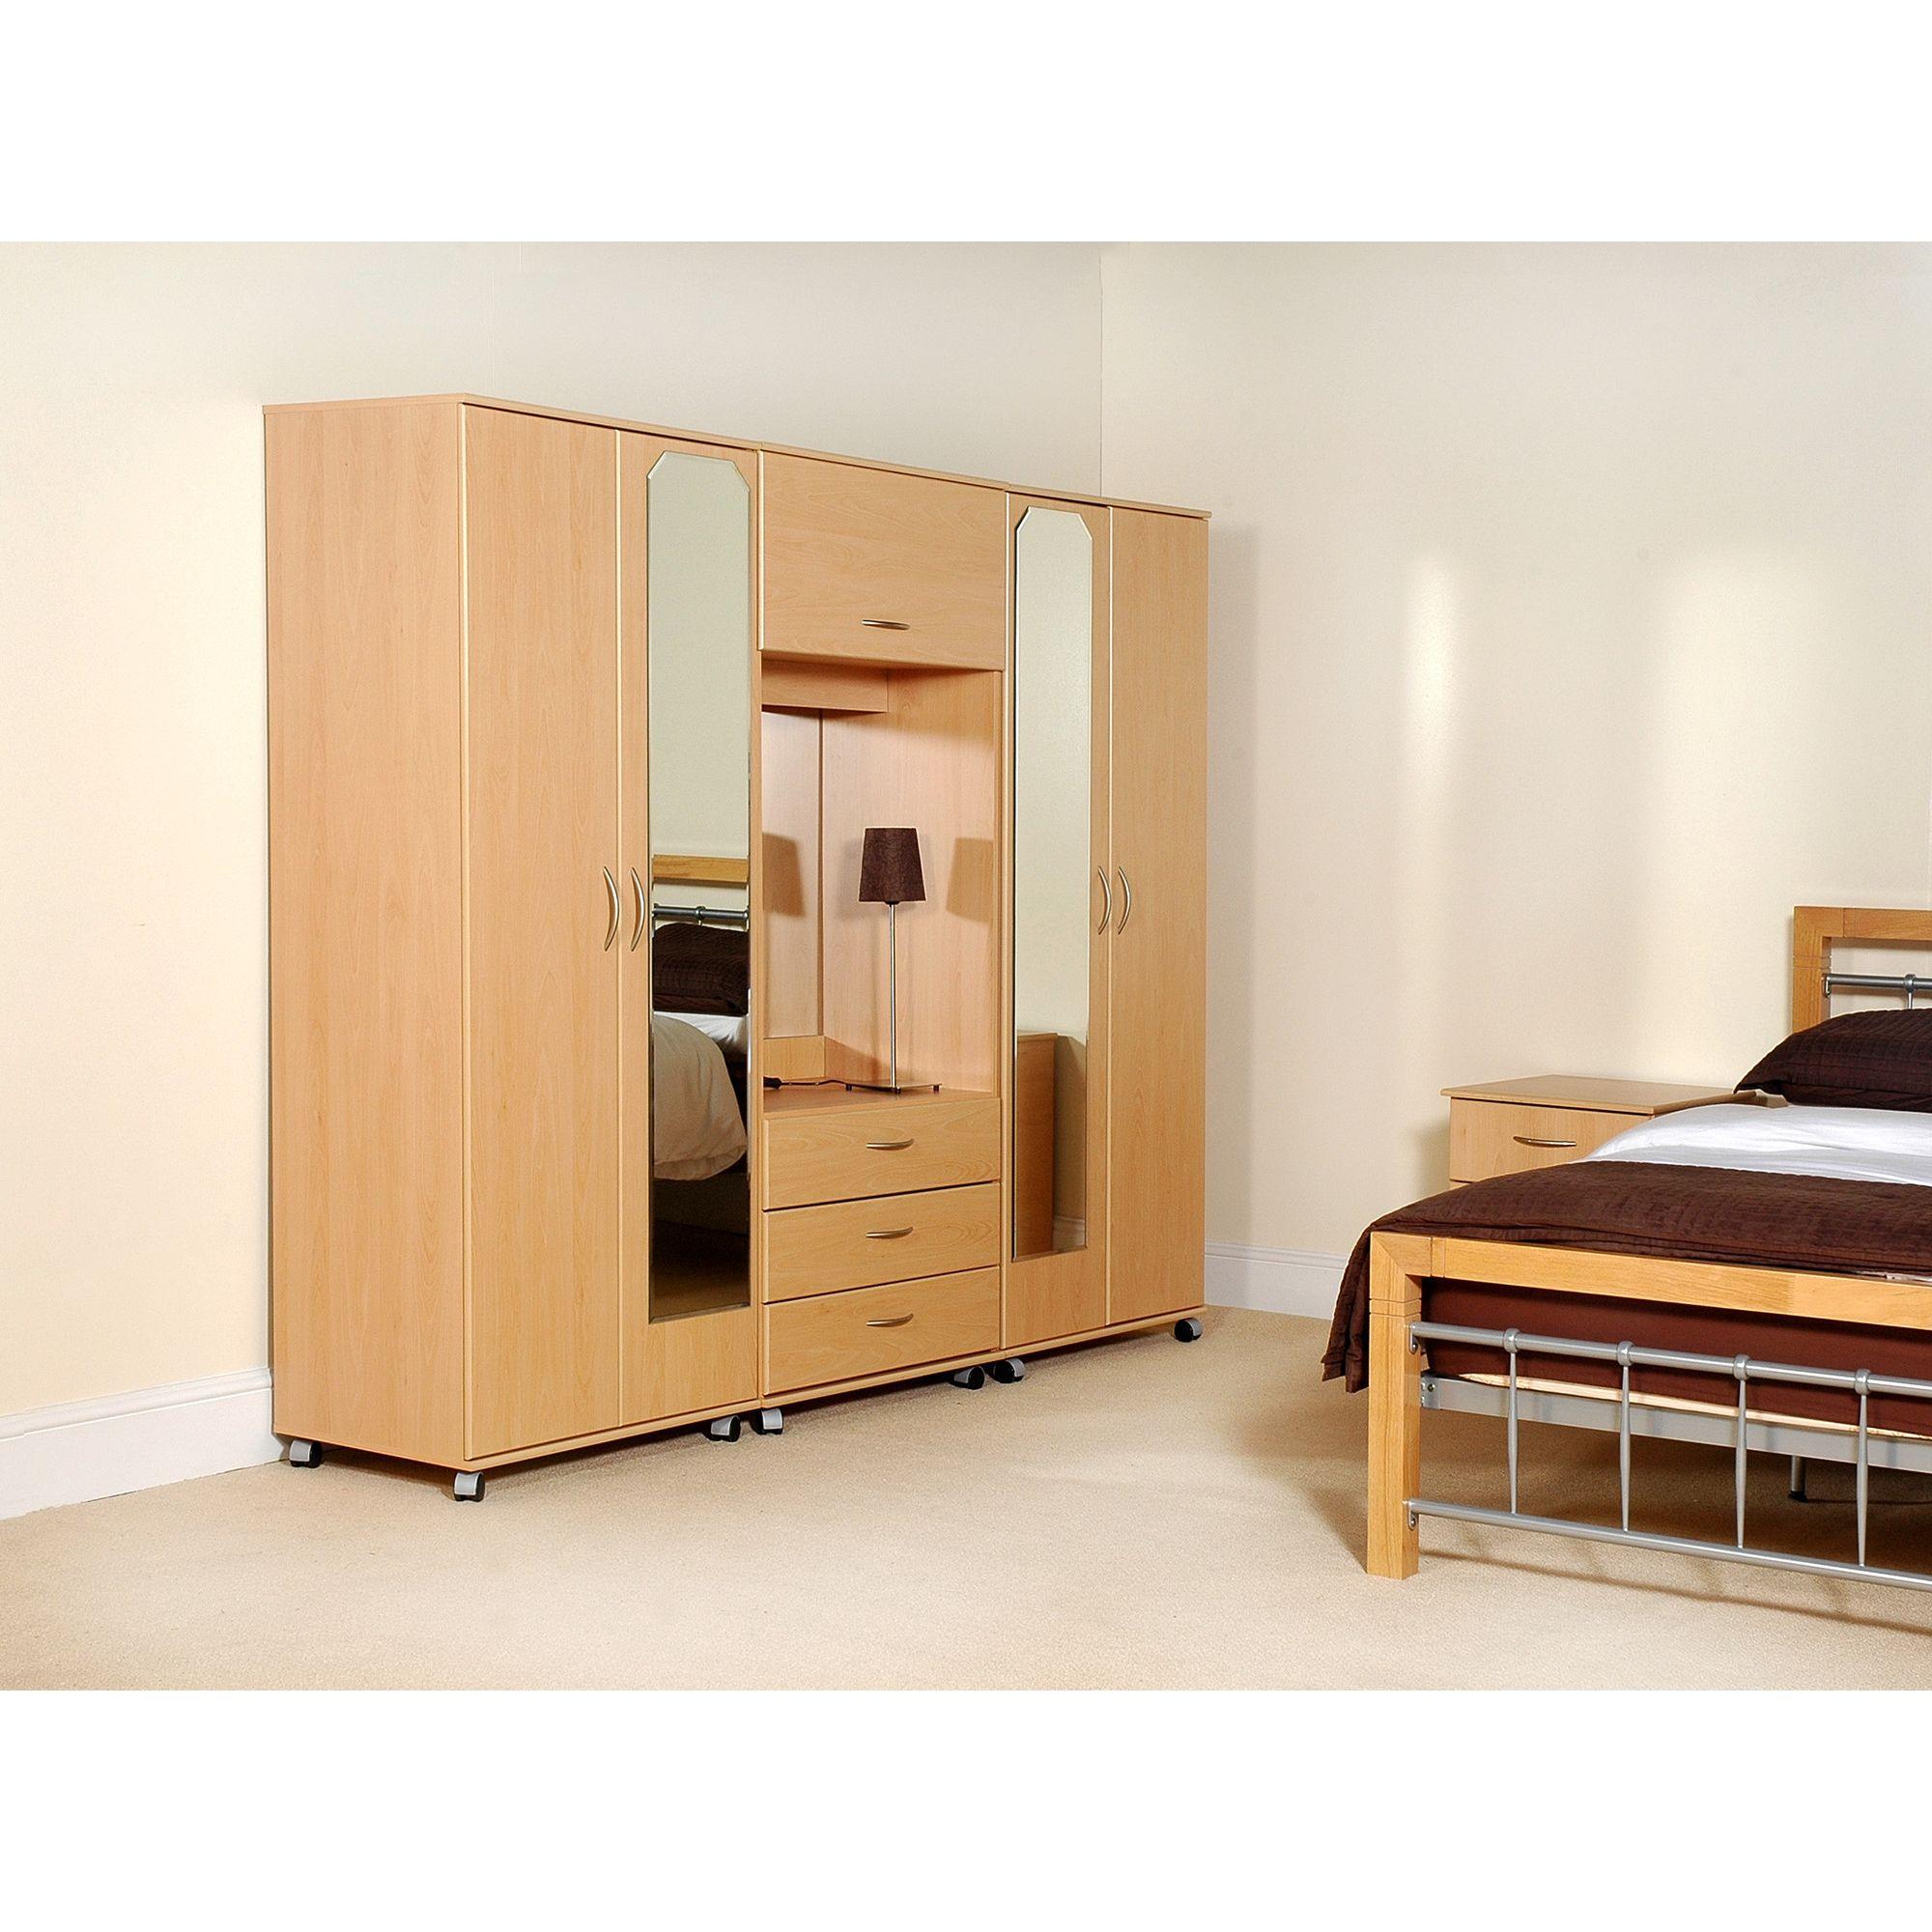 Ideal Furniture New York 4 Door Fitment - Beech at Tesco Direct